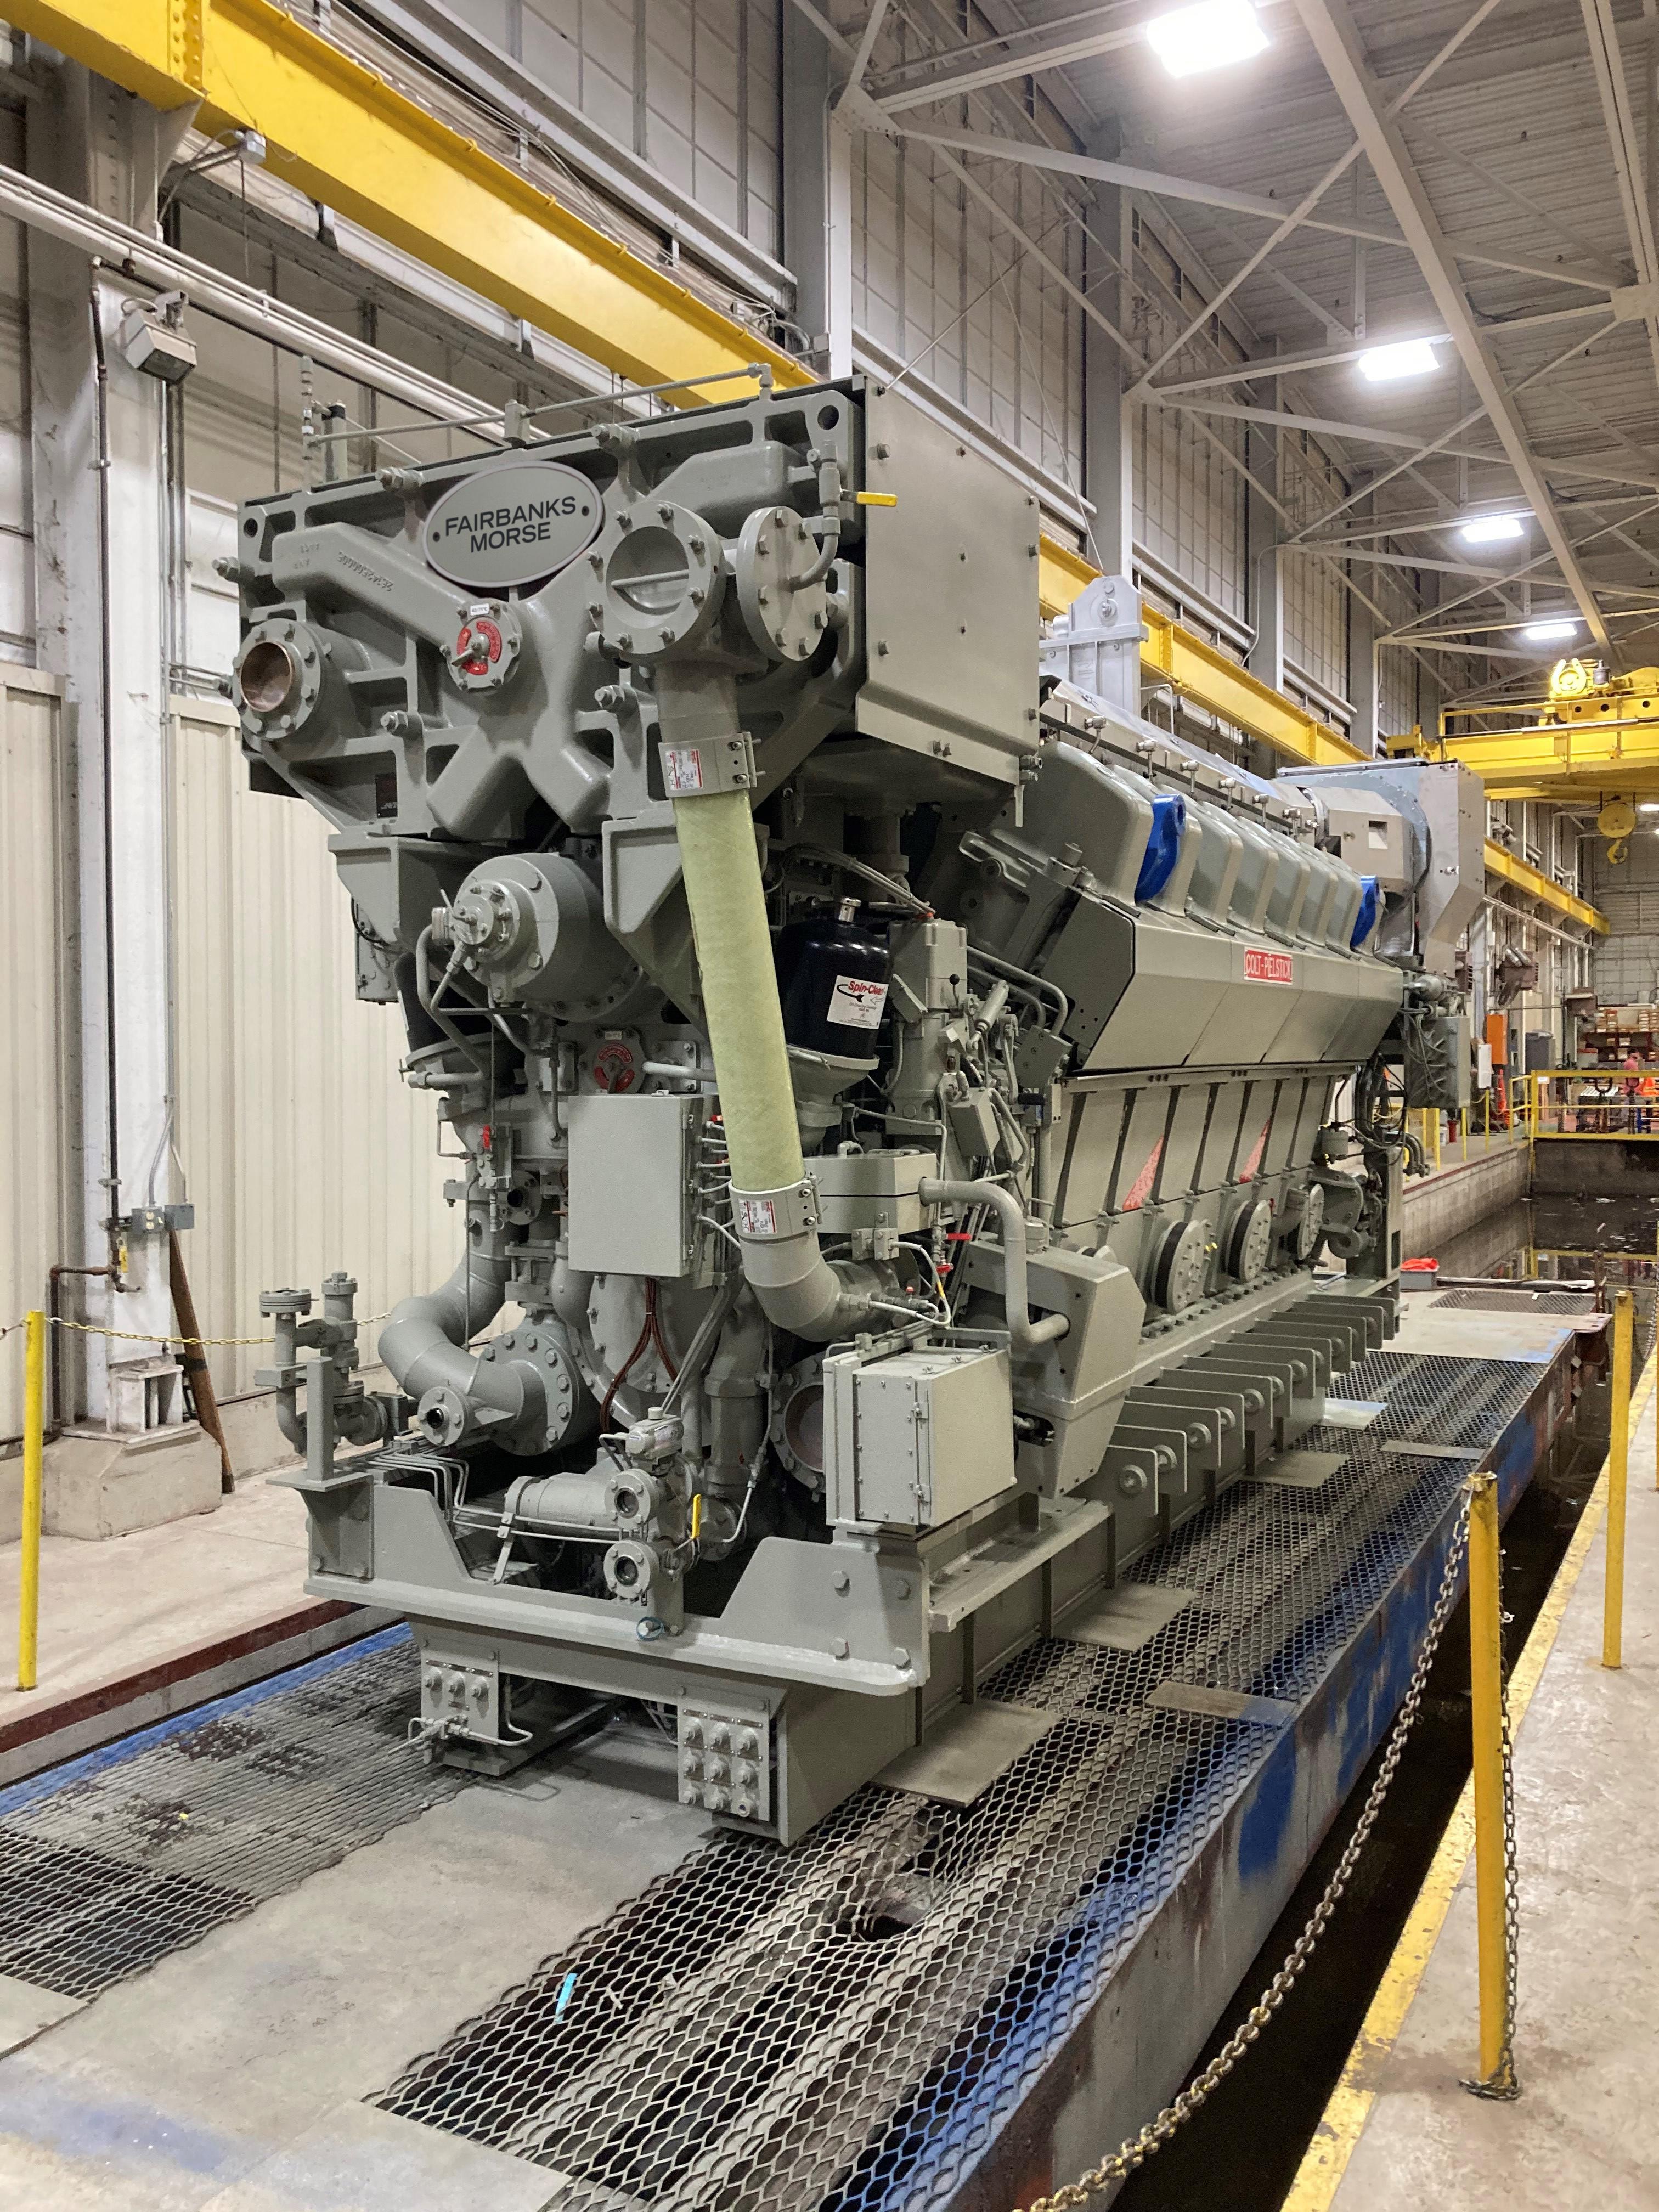 Fairbanks Morse Engine Ships USS Cleveland (LCS 31) Engines to Marinette Marine